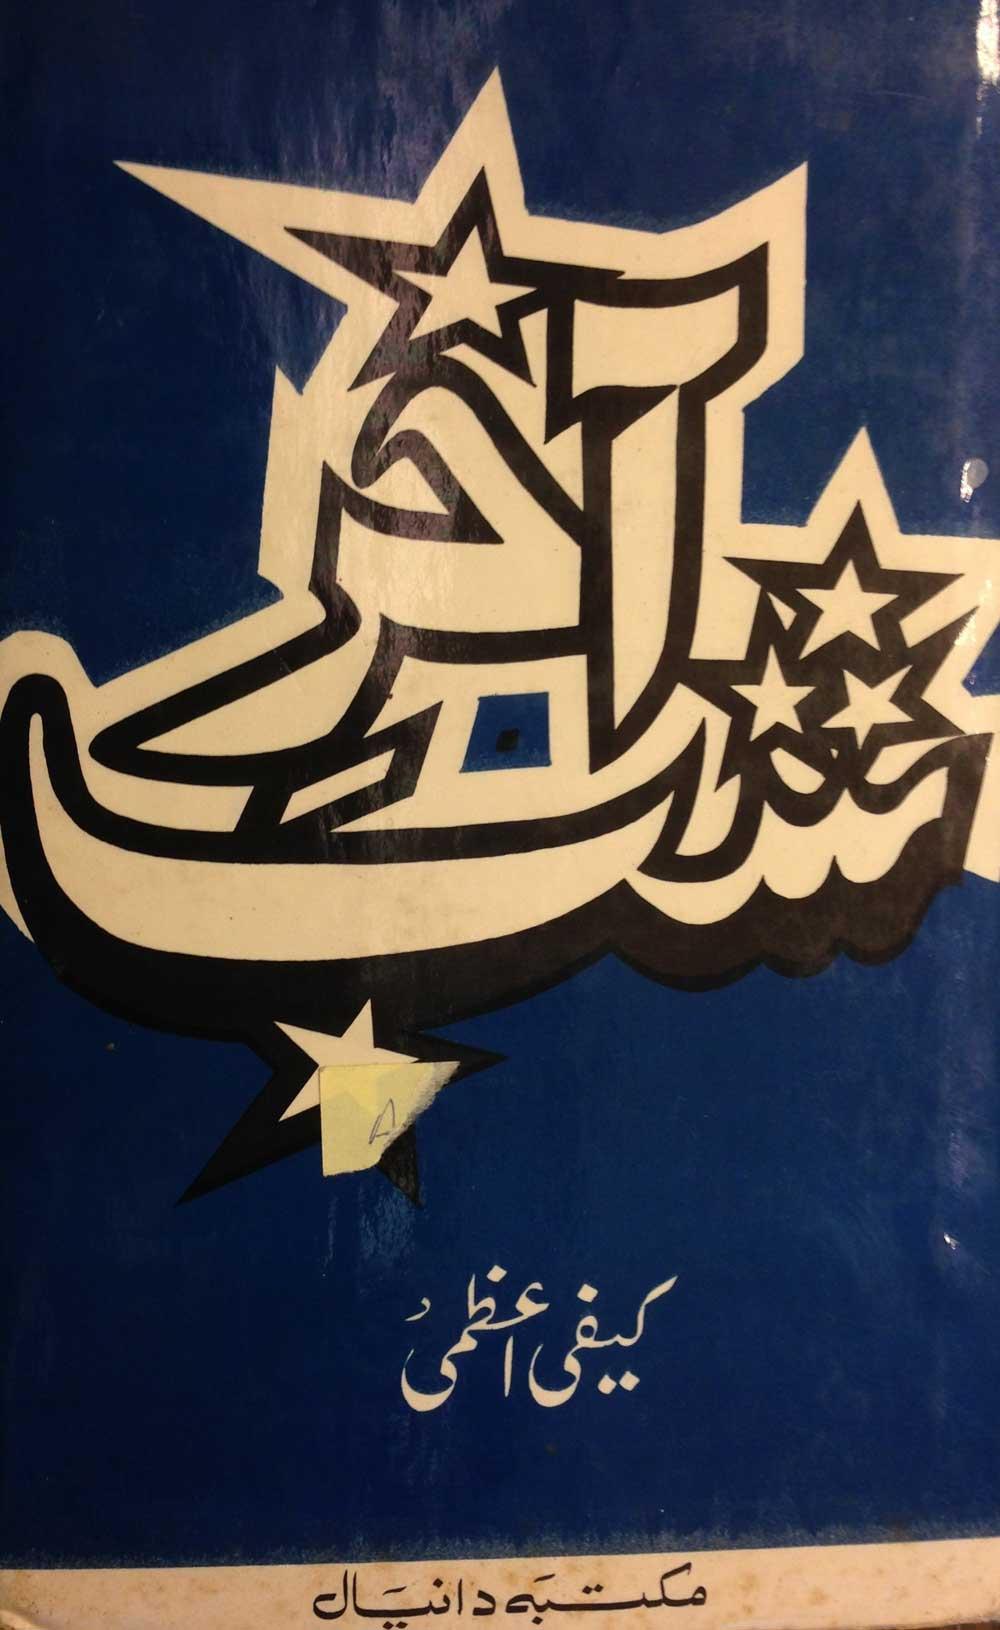 Aakhir-e-shab-by-Kaifi-Azmi-1947